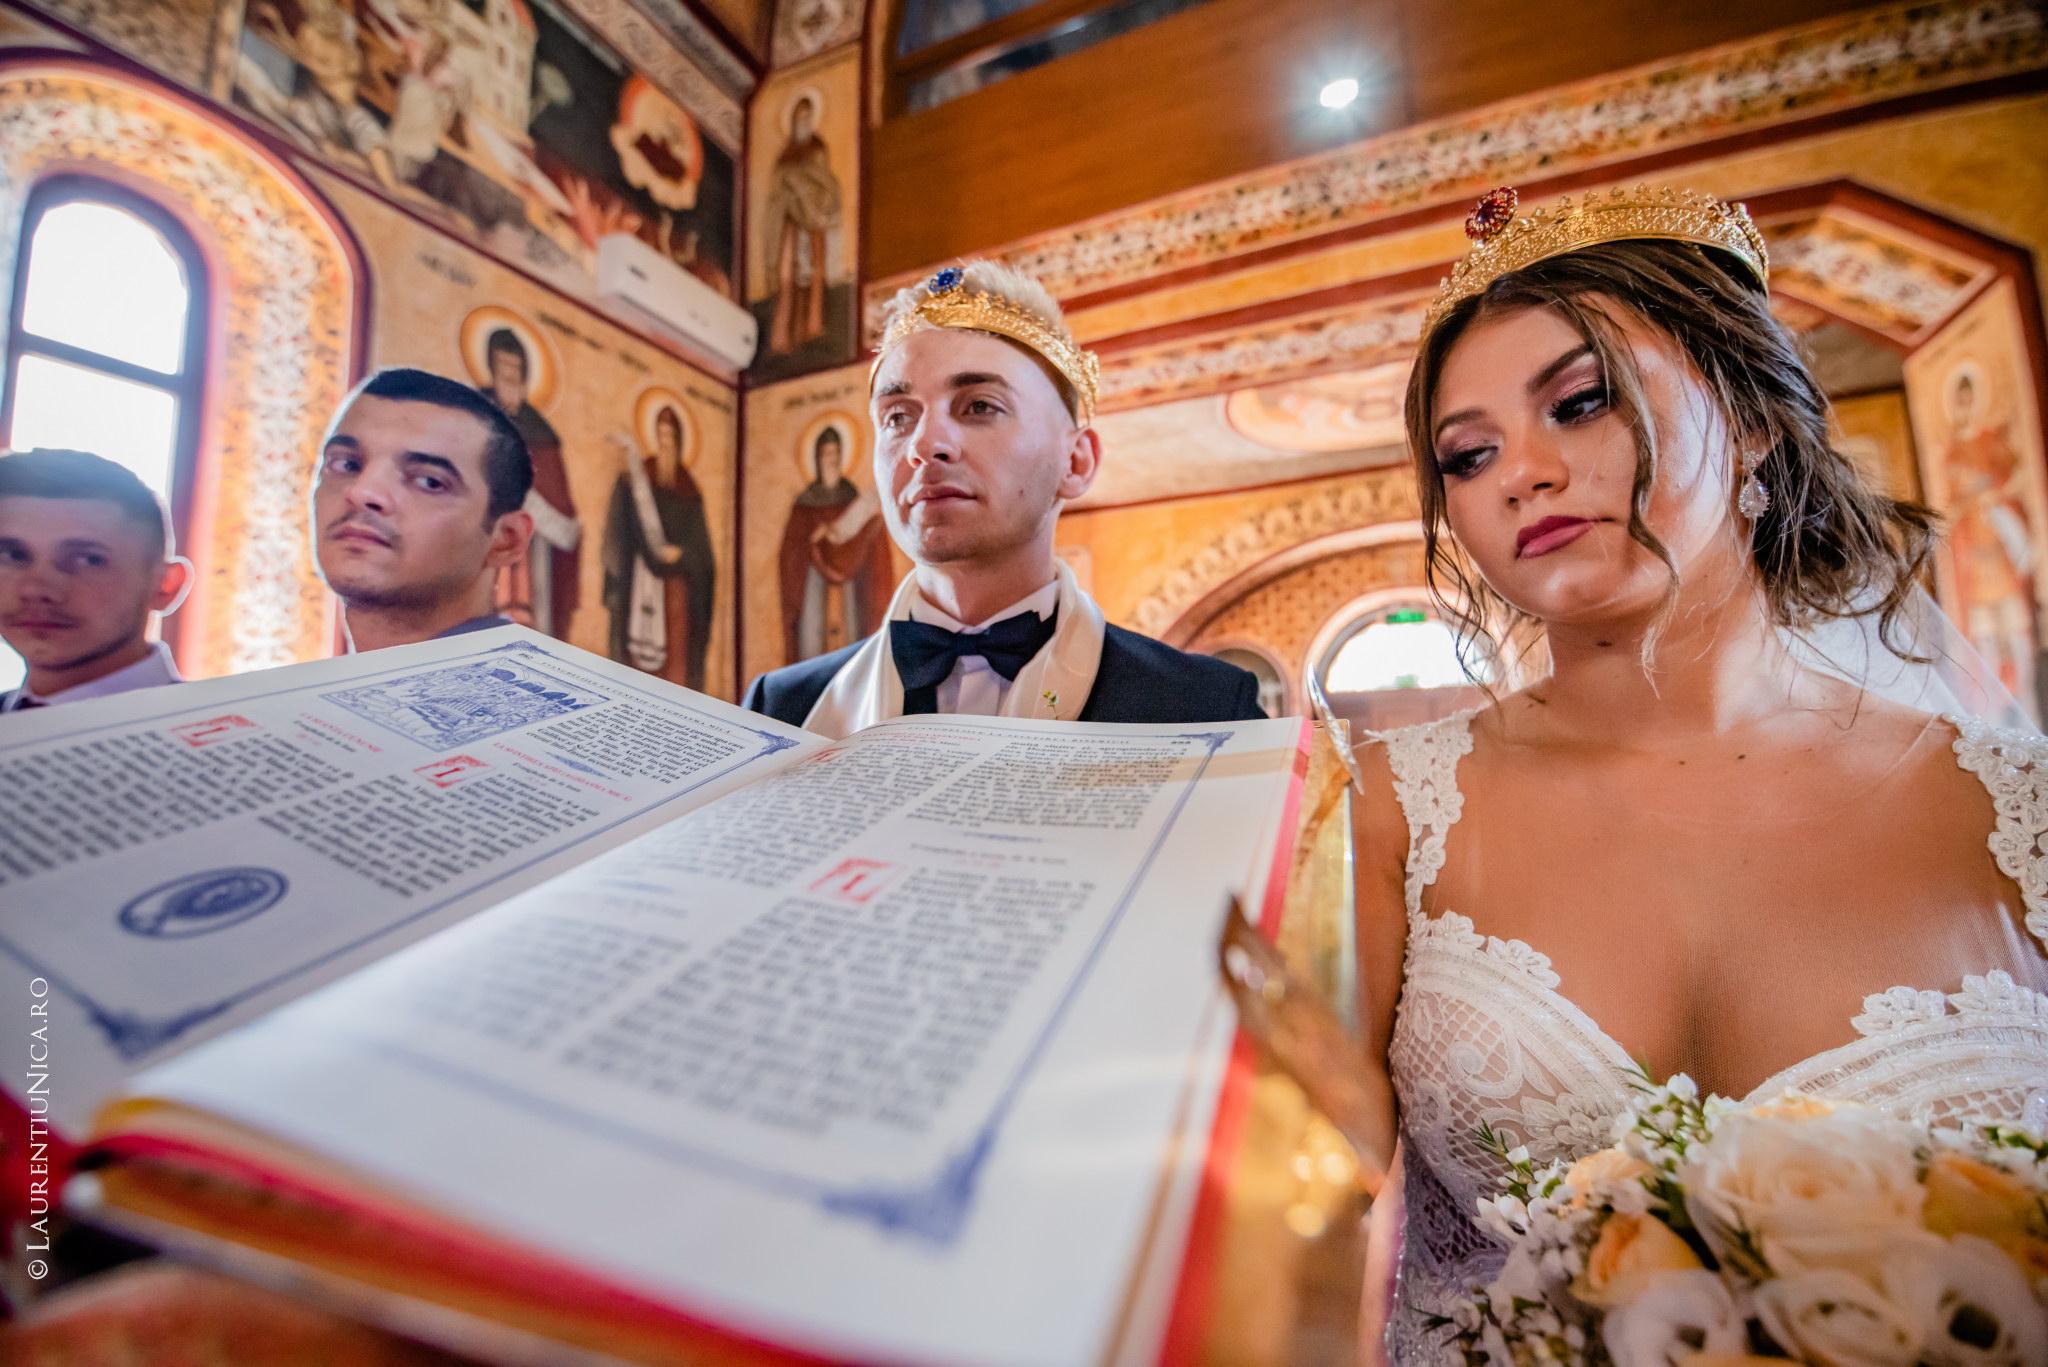 fotografii nunta Roxana si Cosmin fotograf nunta laurentiu nica 22 - Roxana & Cosmin | Fotografii nunta | Ticleni, judetul Gorj